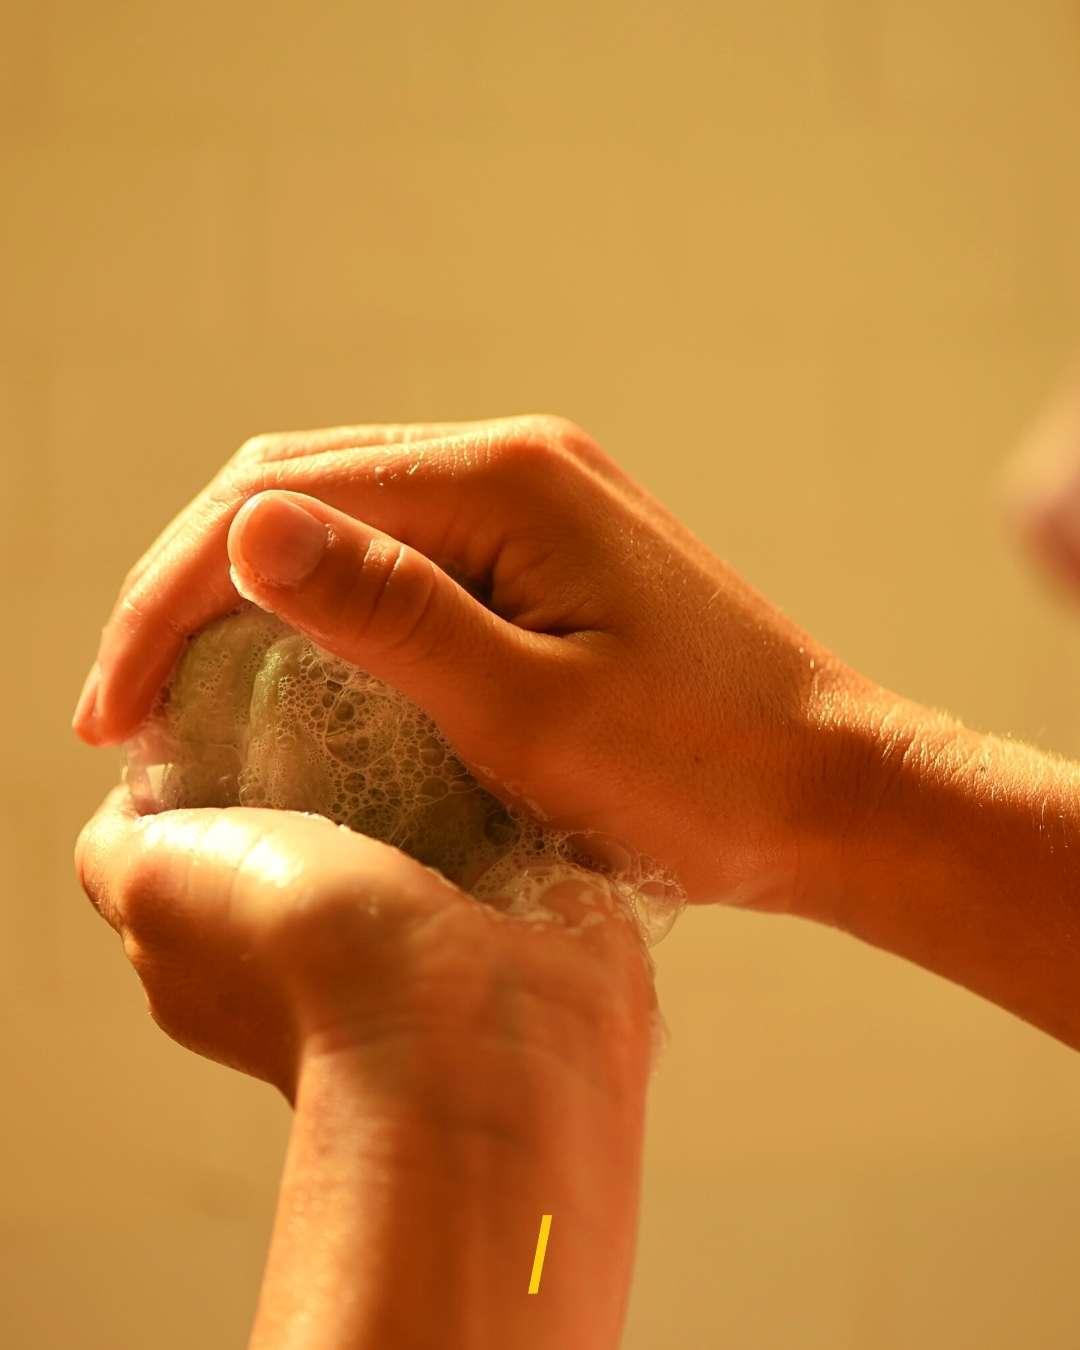 Le shampoing solide doux - Umai